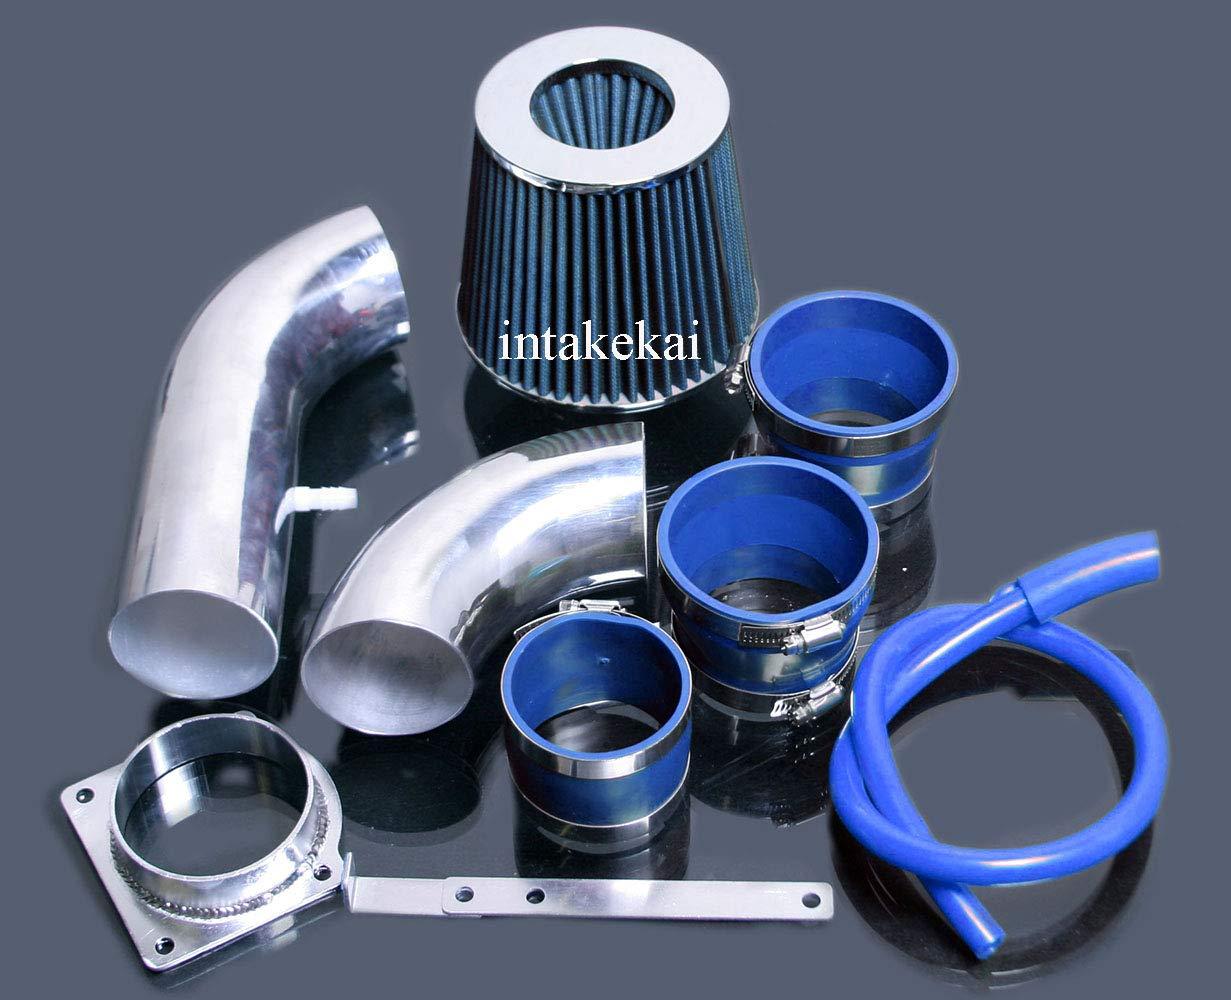 BLUE 2001-2003 MAZDA B4000 4.0 4.0L SOHC V6 ENGINE FILTER FOR 2001-2003 FORD EXPLORER//EXPLORER SPORT TRAC//RANGER PERFORMANCE COLD AIR INTAKE KIT